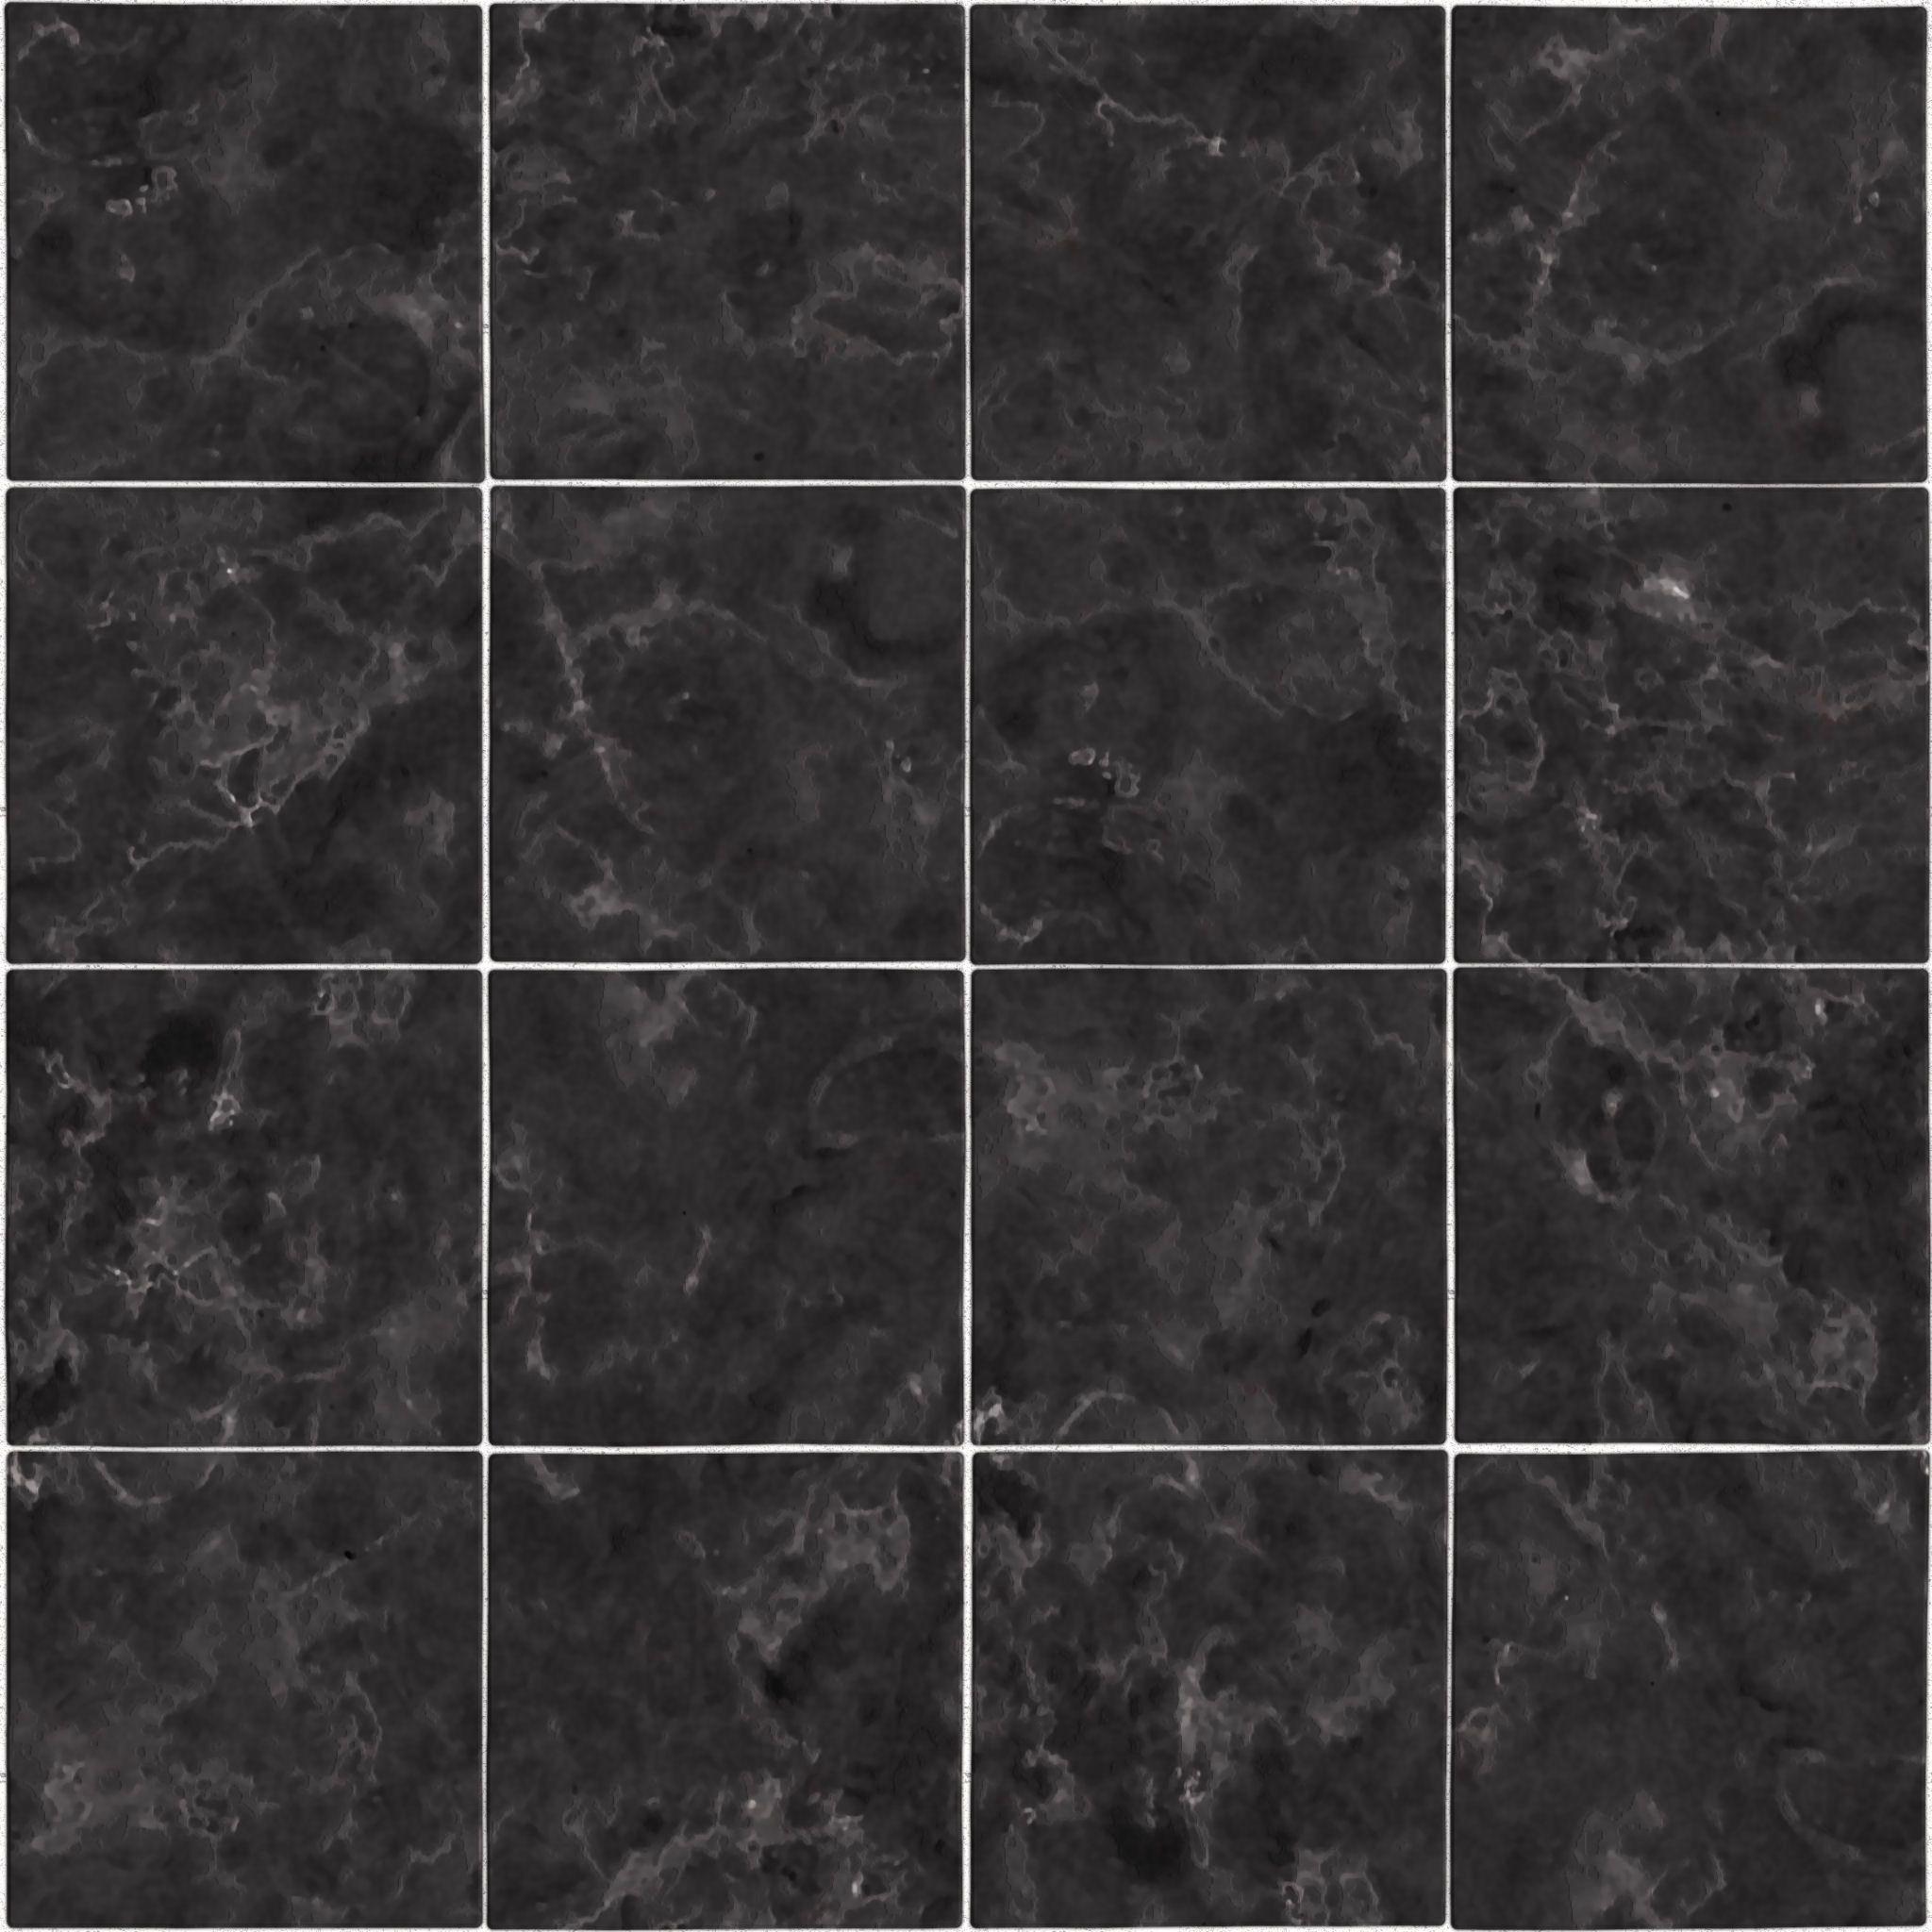 Black Marble Floor Texture New Home Ideas Trends Floor Idea Marble Tile Floor Bathroom Floor Tiles Tile Floor